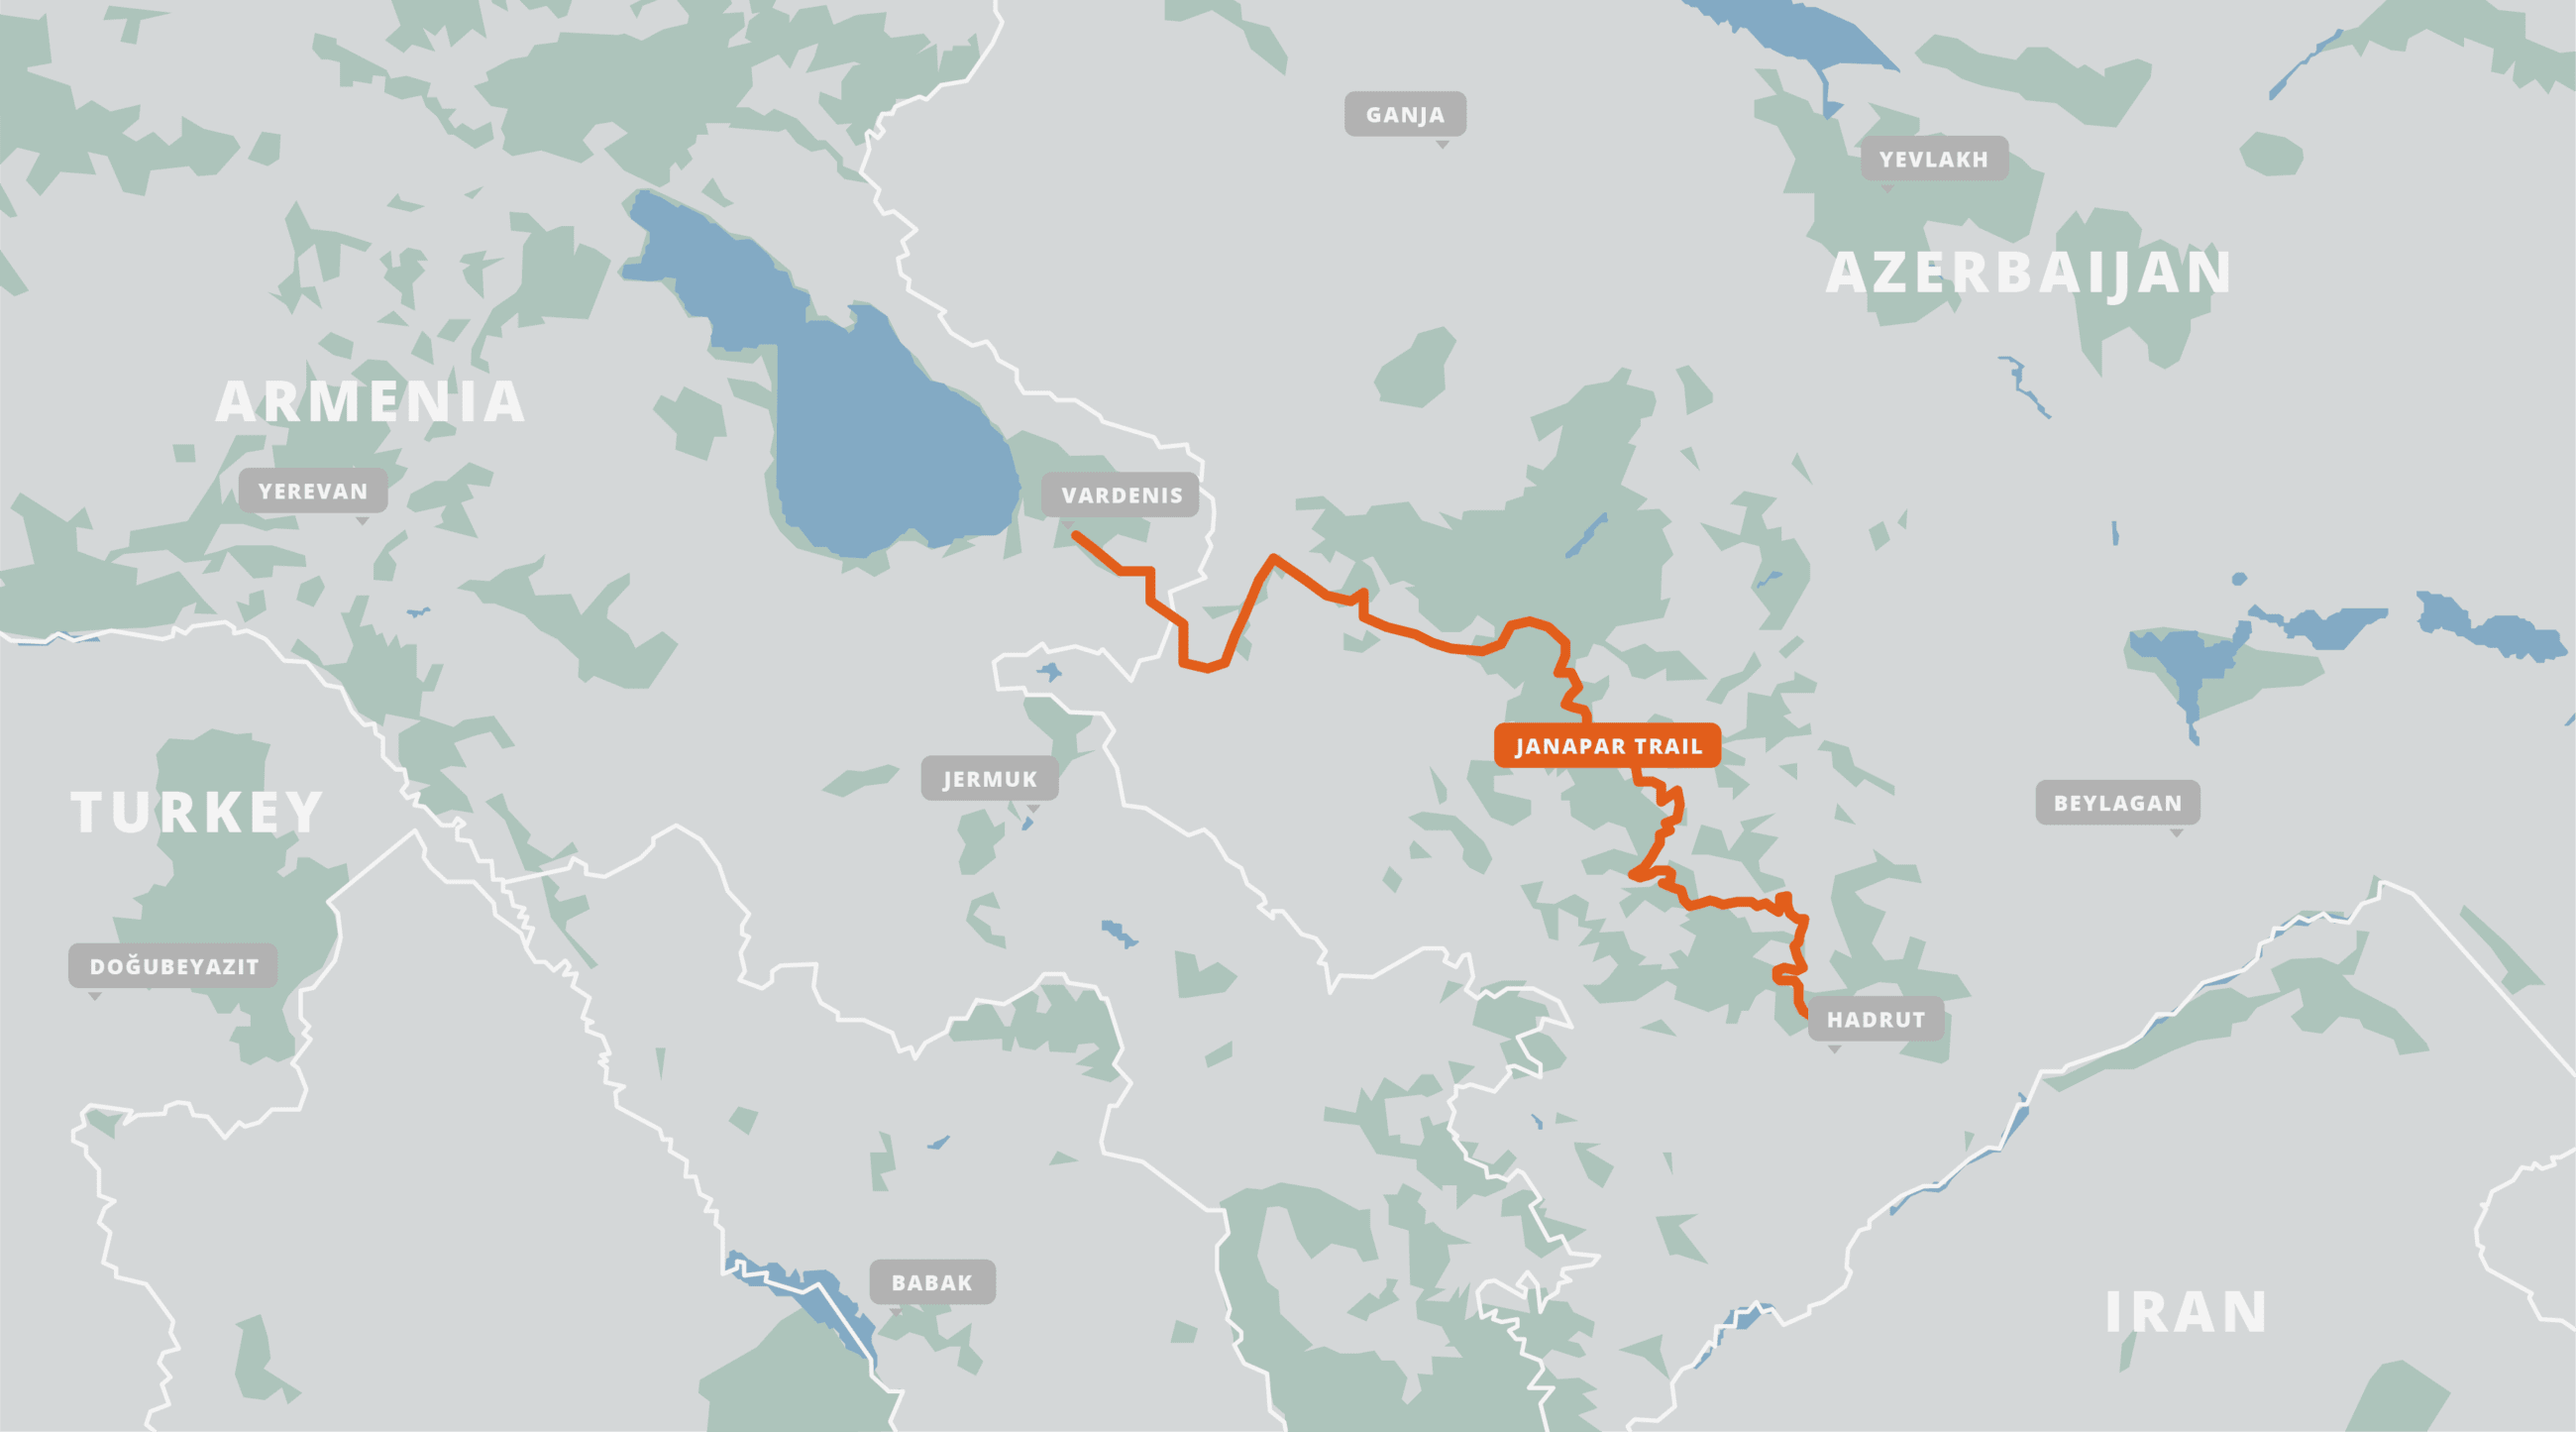 A map of the Janapar Trail.